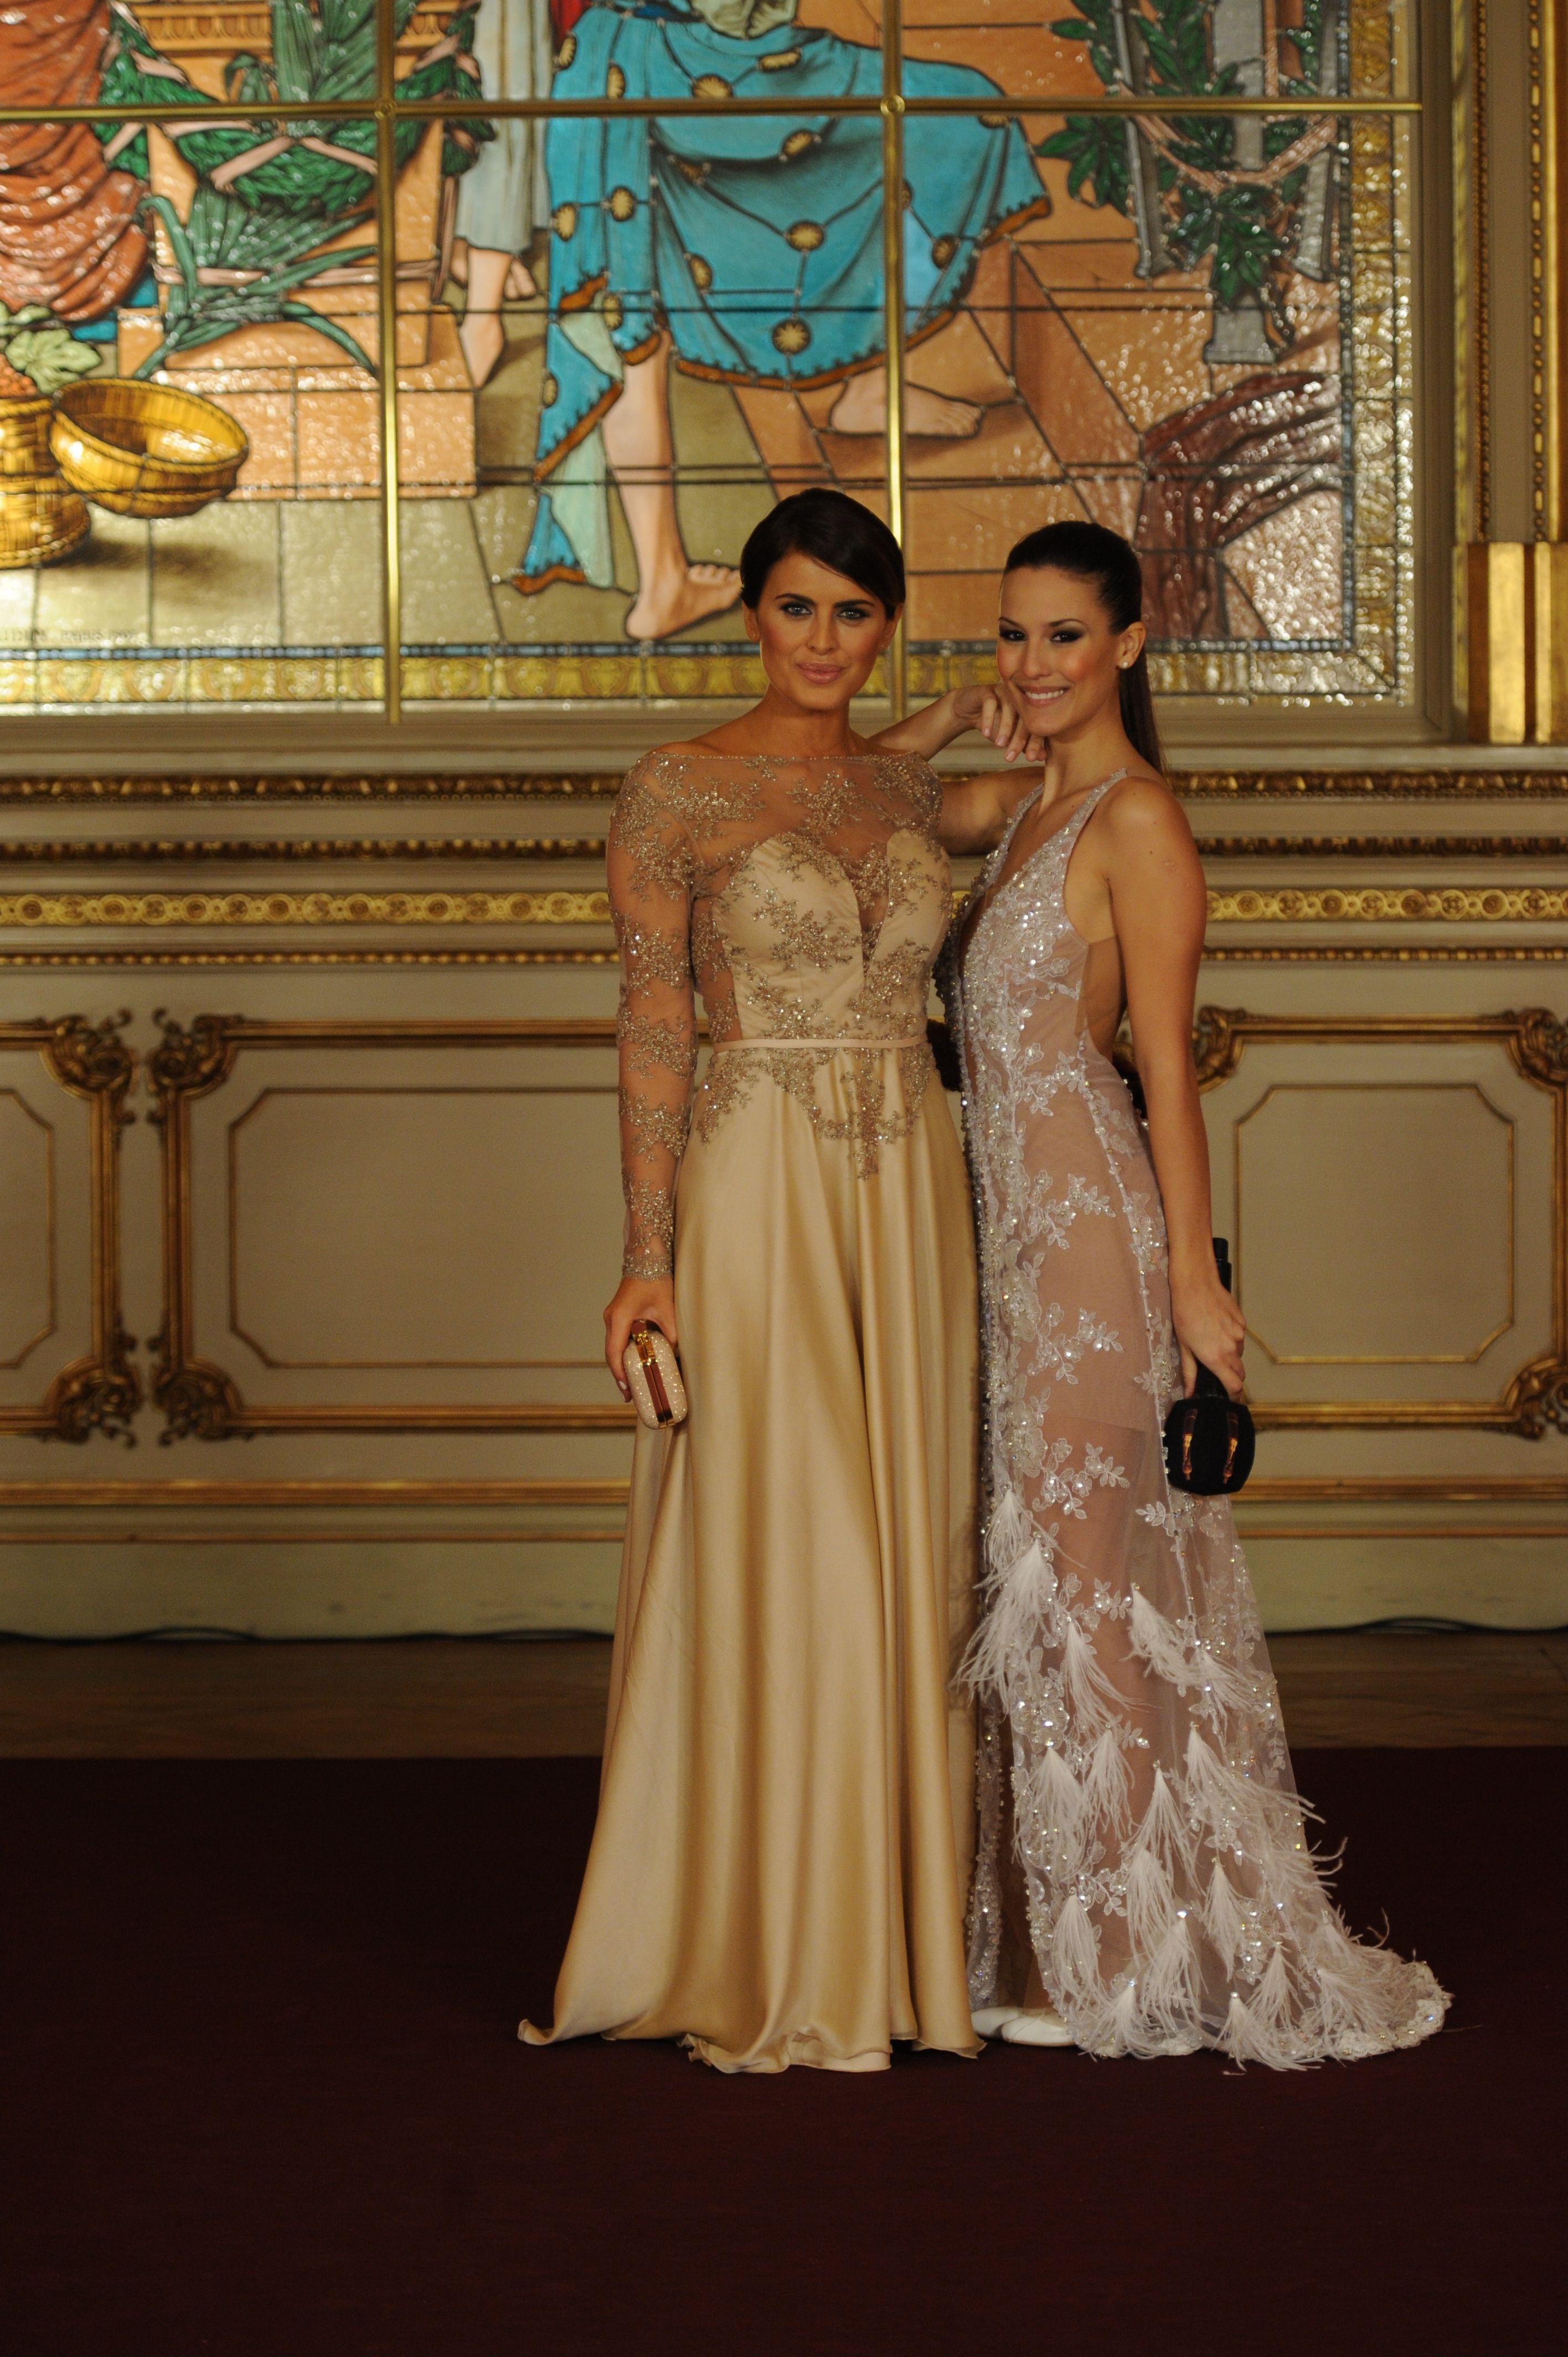 Silvina Luna y Luli Fernandez. telefe.com